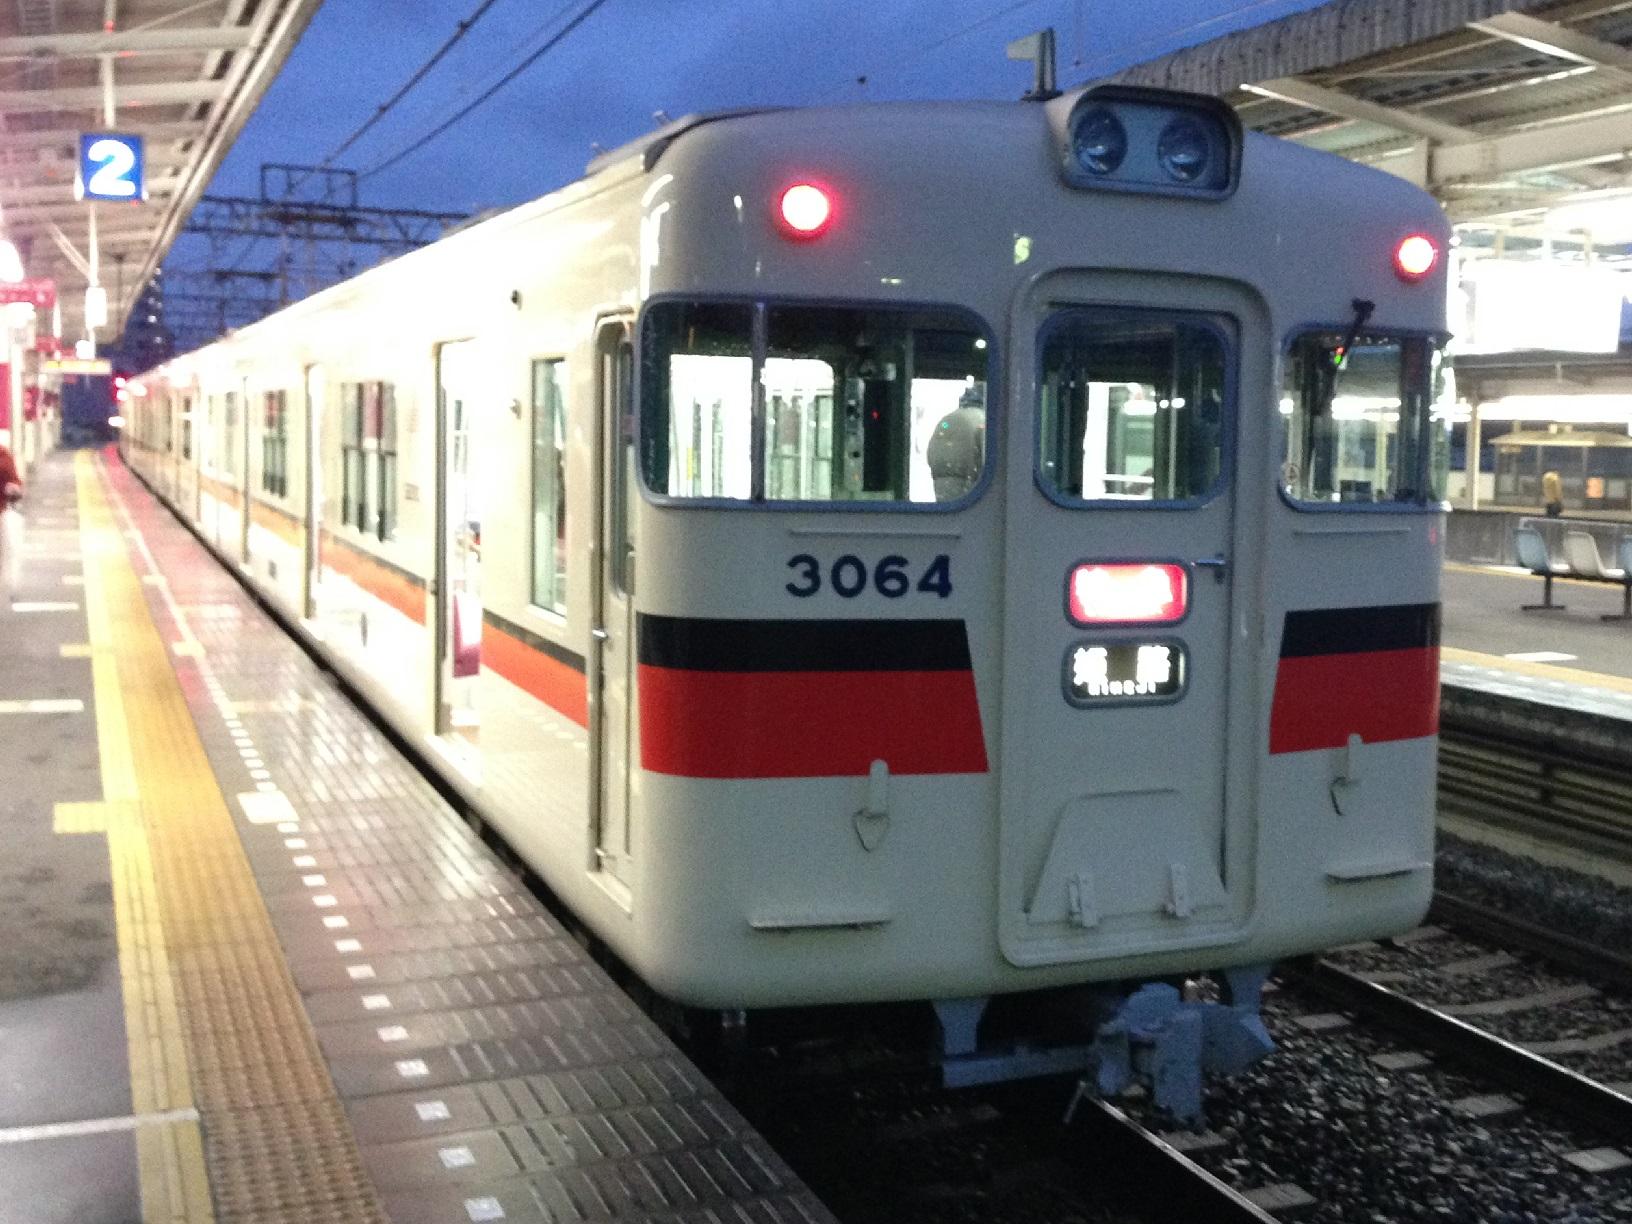 sanyo3064f.jpg